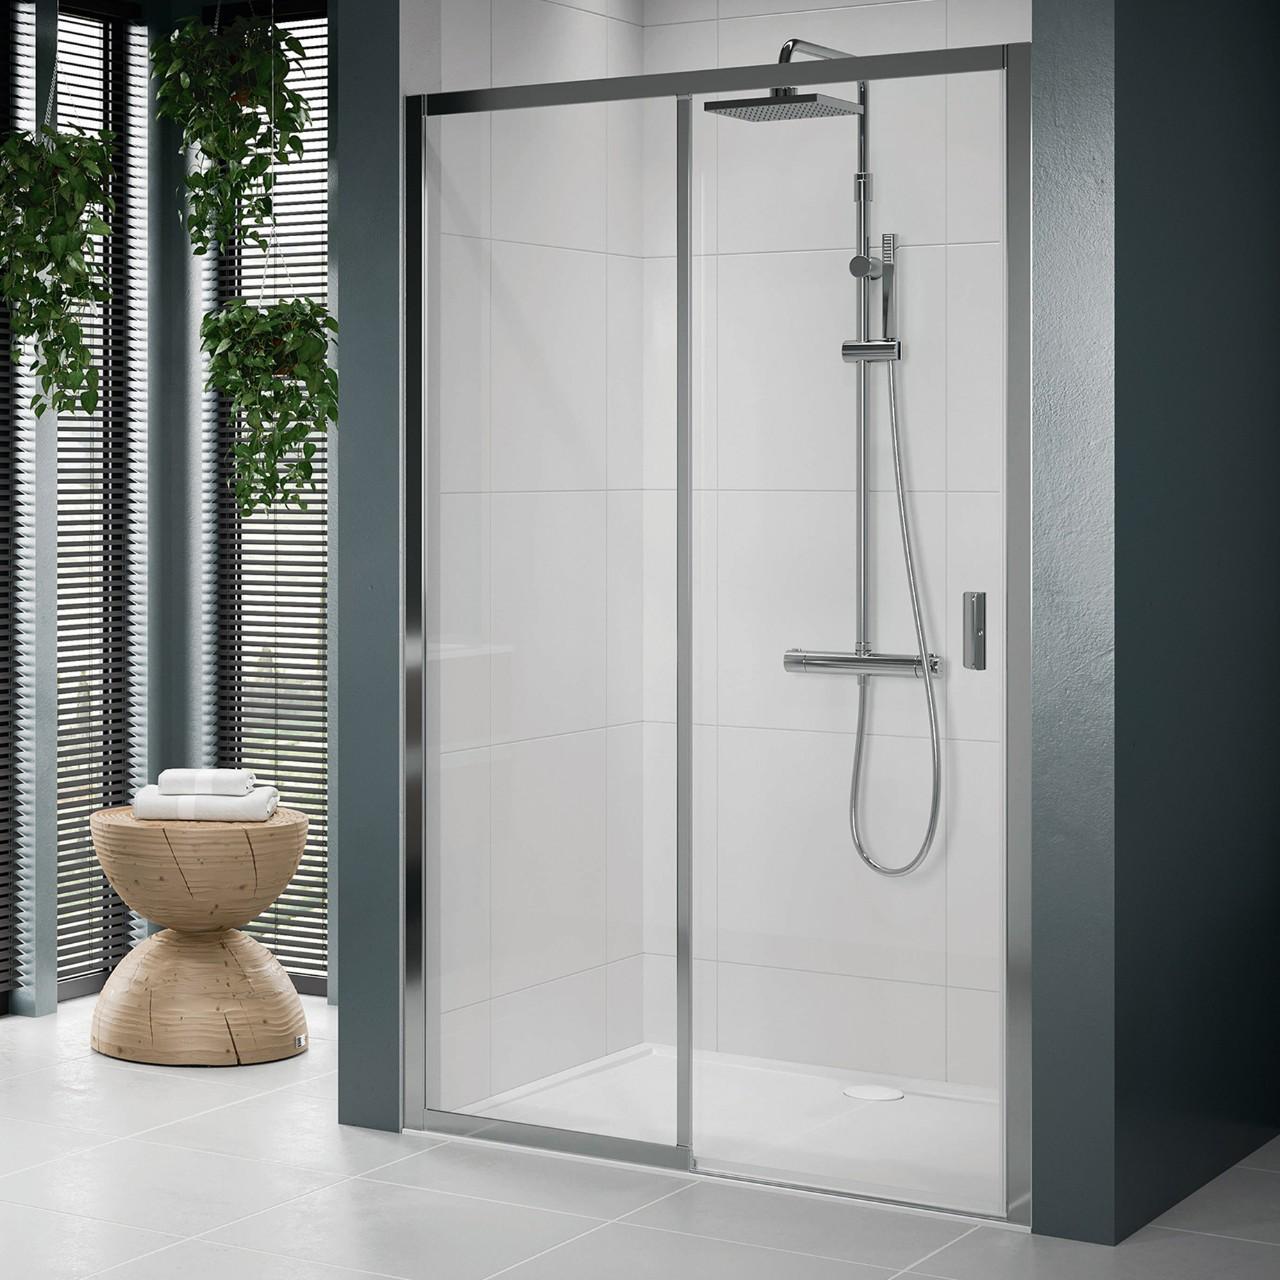 Shower enclosures Lunes 2.0 2PH+F - Novellini